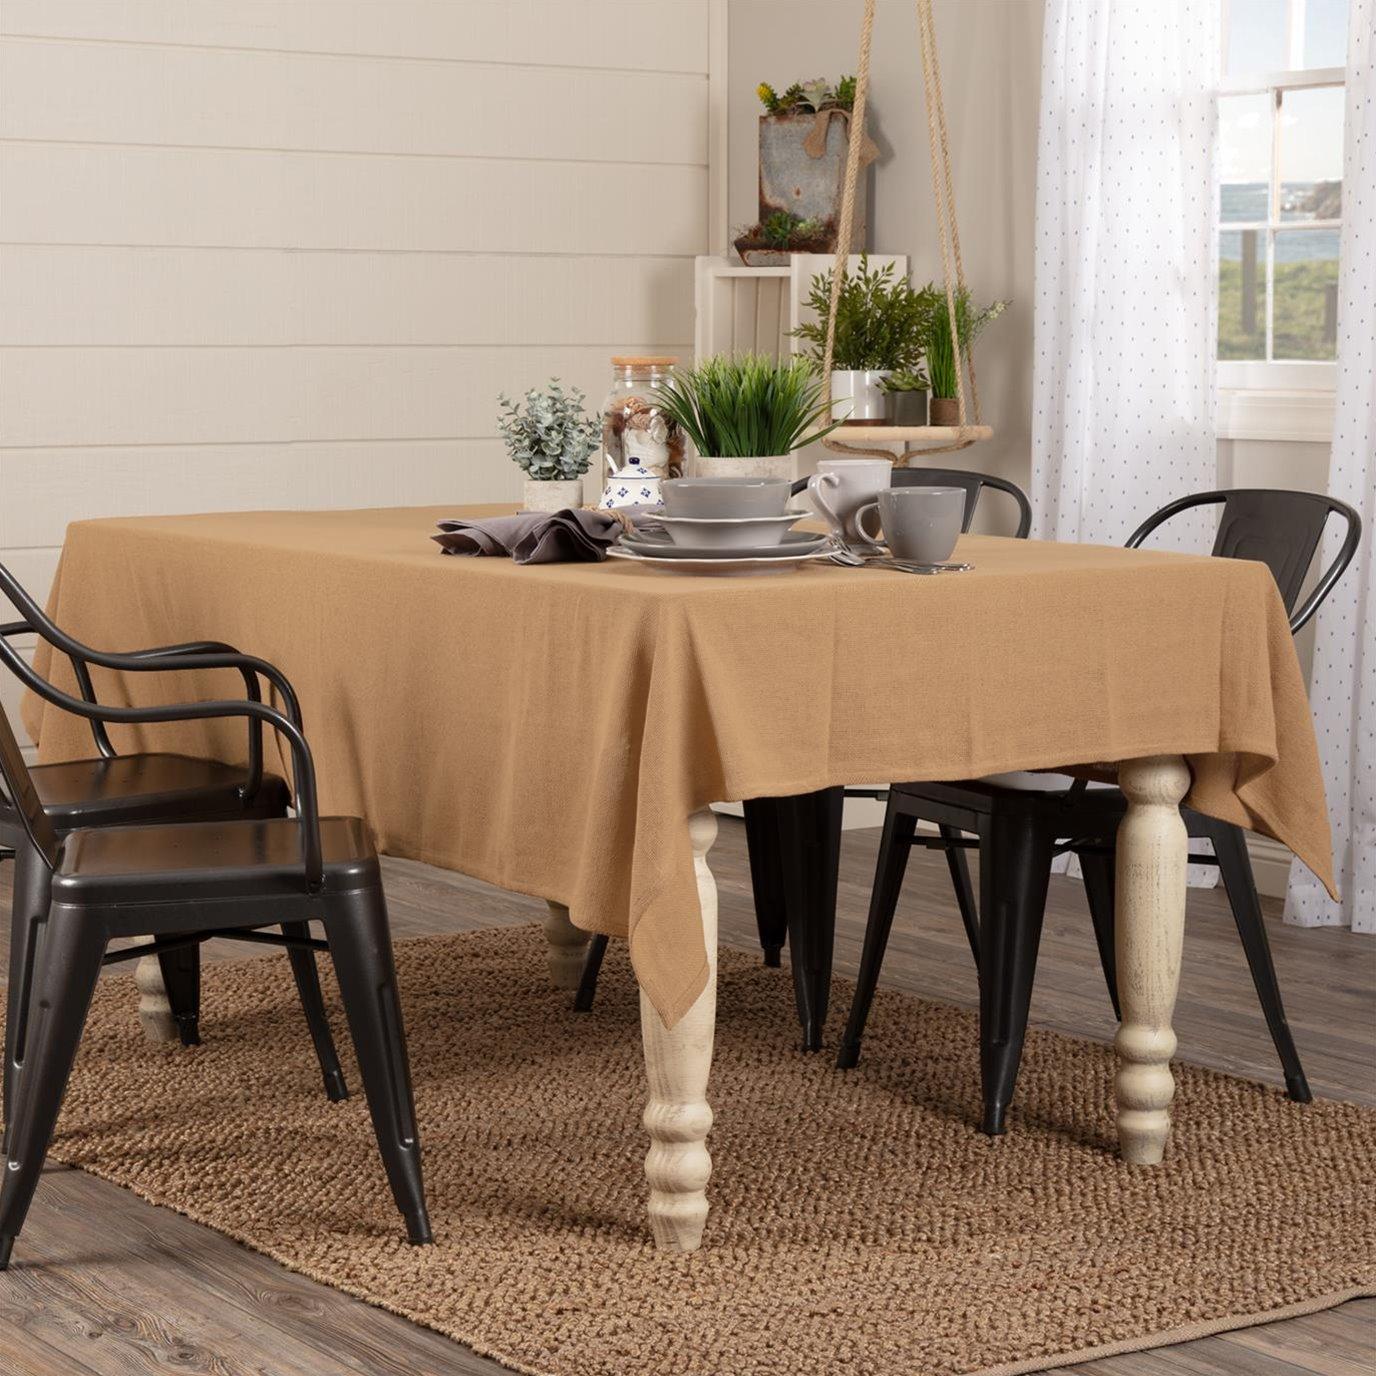 Burlap Natural Table Cloth 60x80